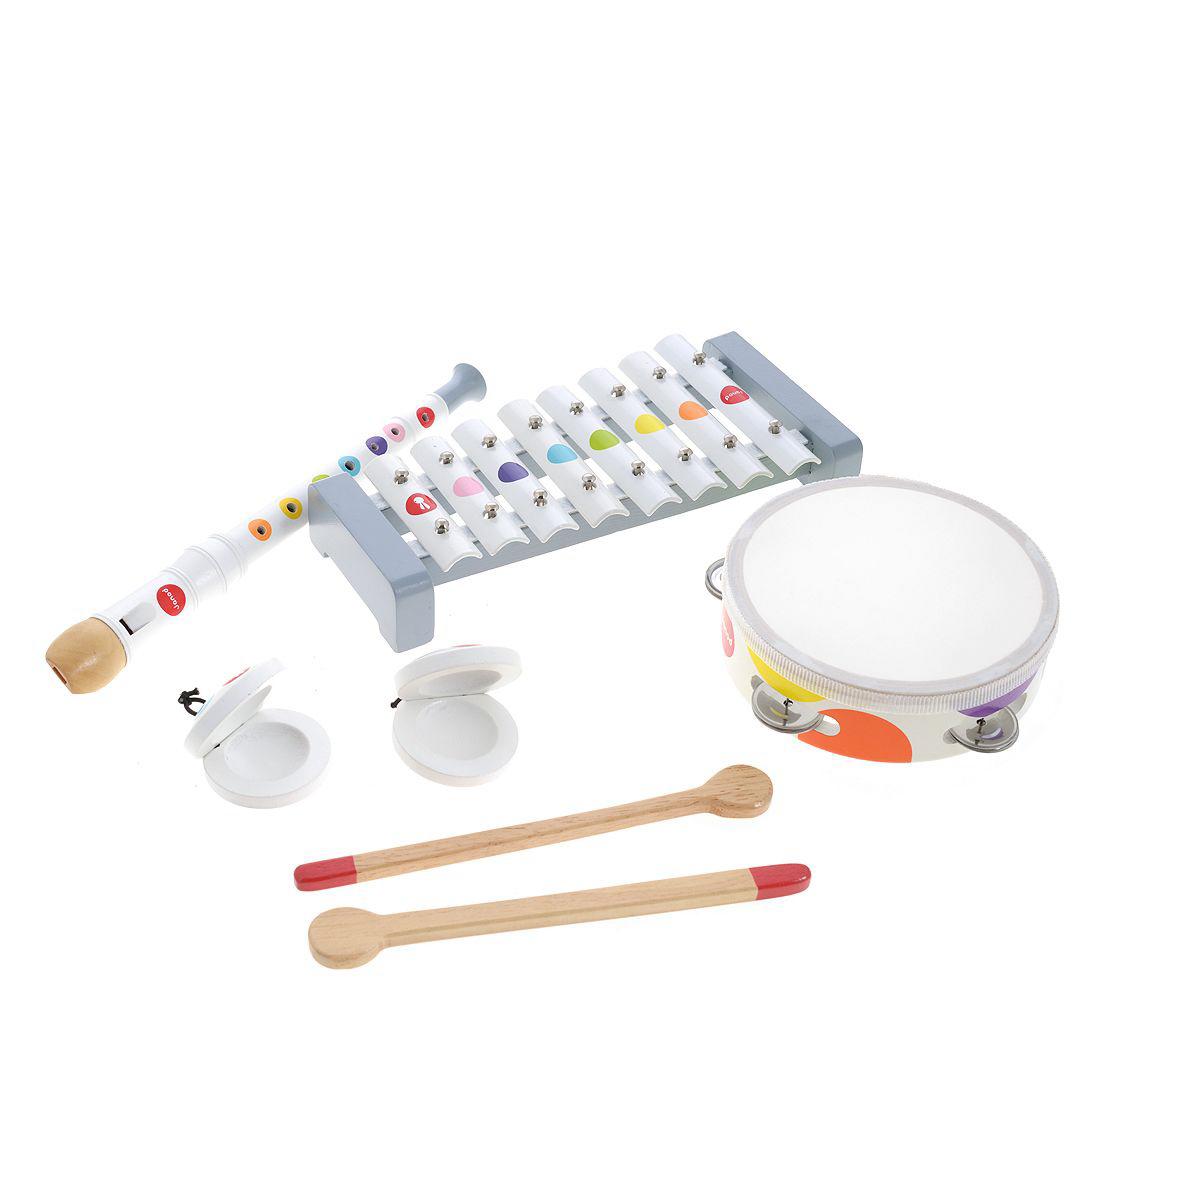 Набор белых музыкальных инструментов  металлофон, флейта, бубен, кастаньеты - Музыкальные наборы, артикул: 160416